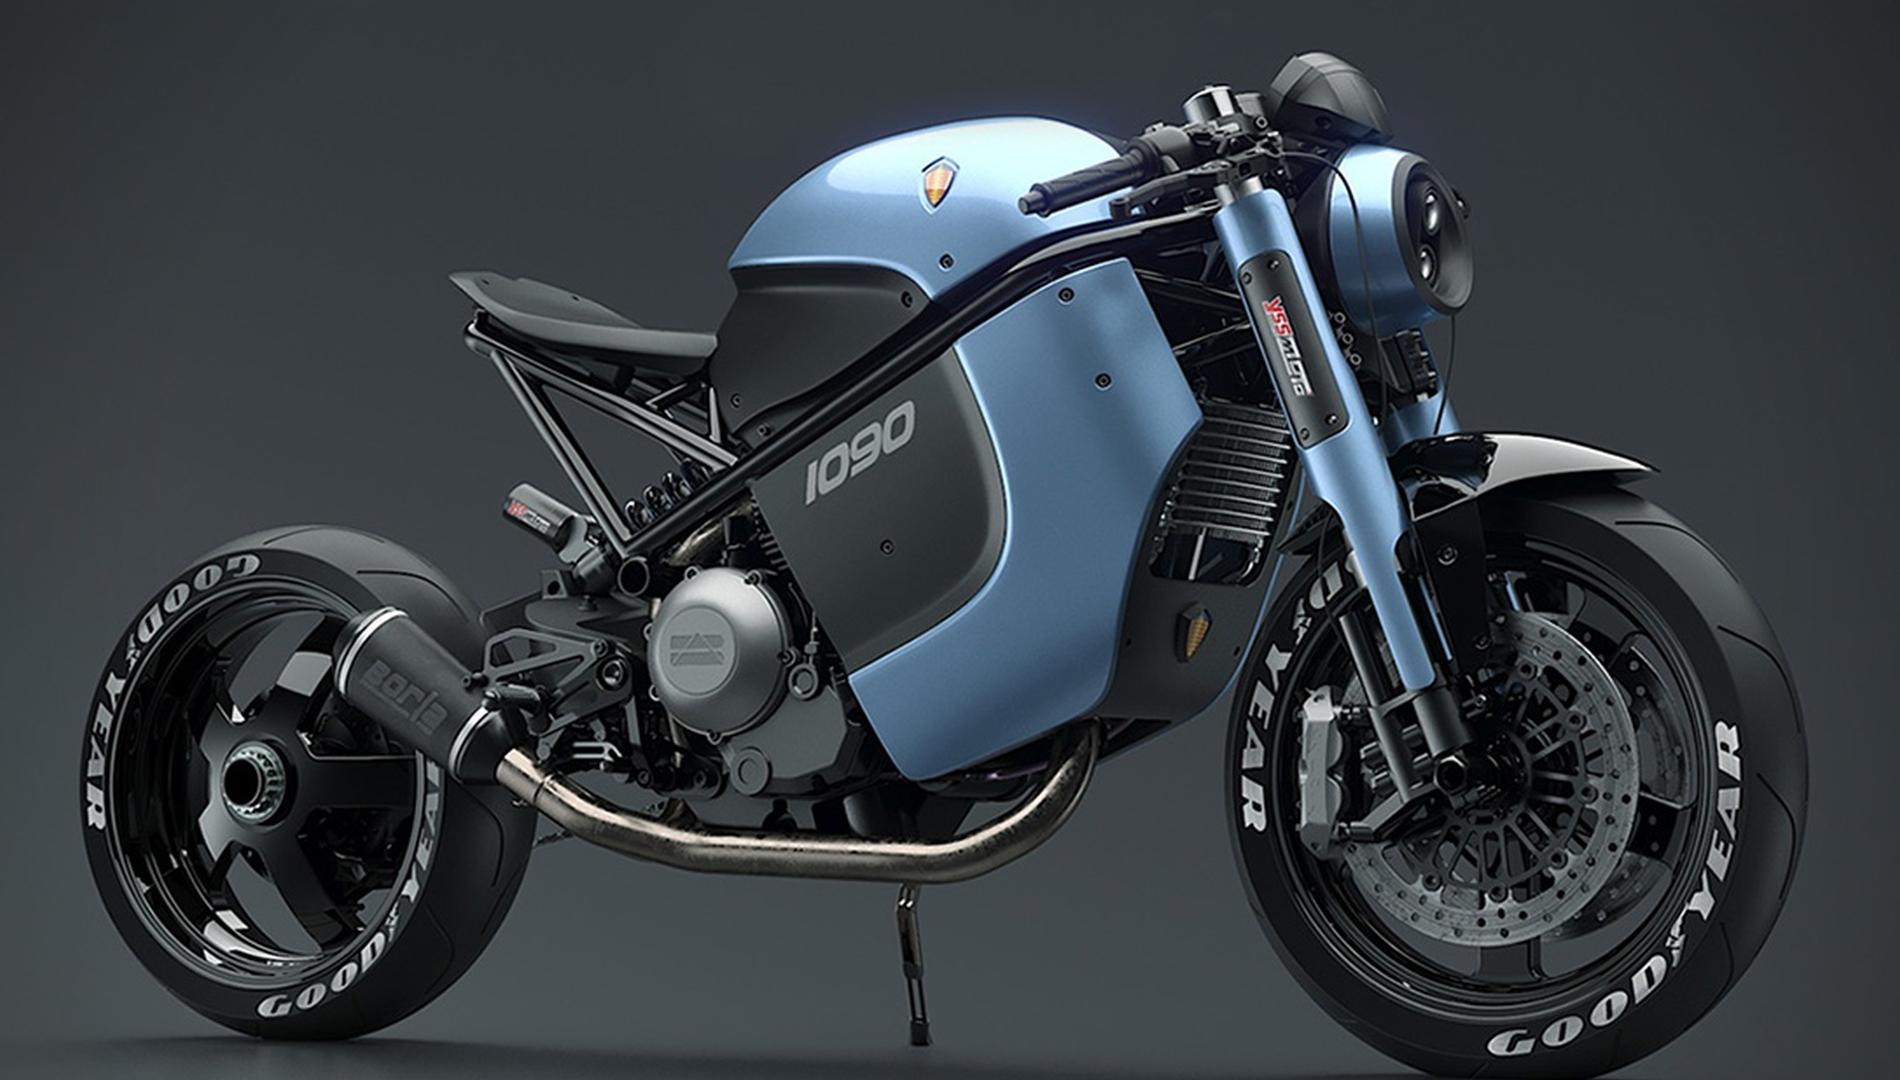 Koenigsegg-Bike-1090-Concept-Motorcycle-01.jpg